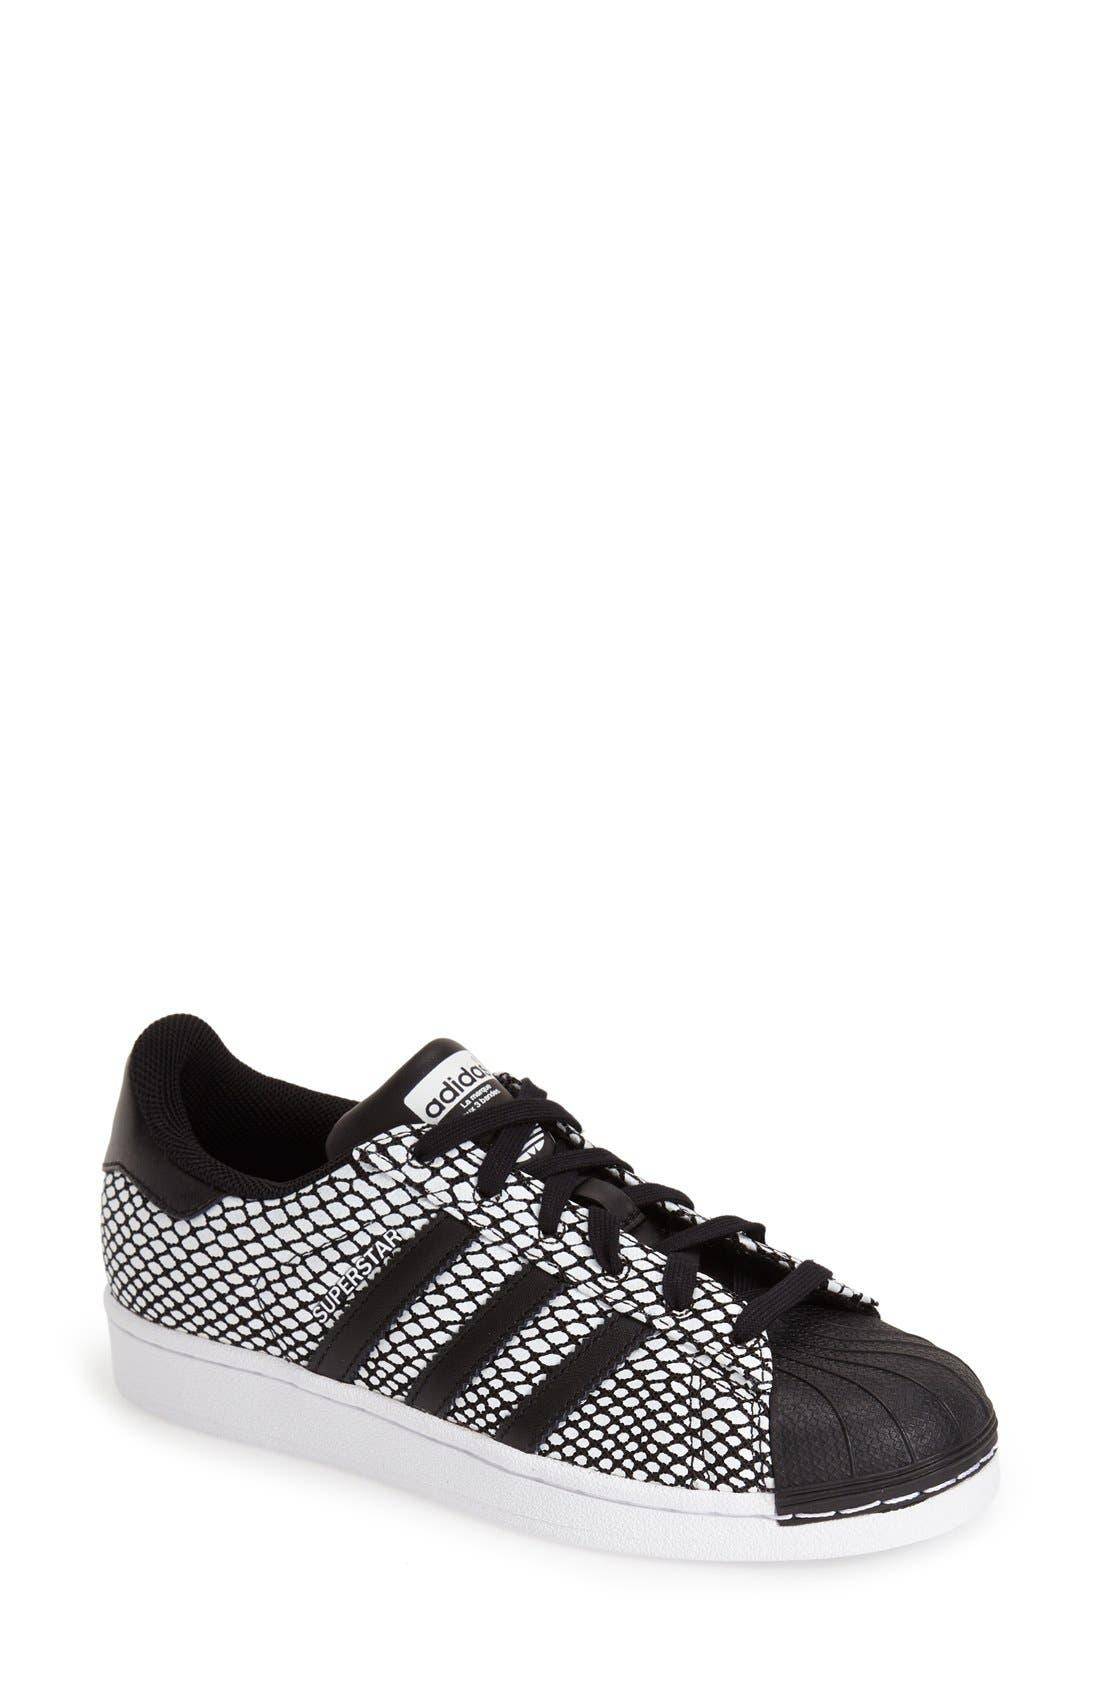 Alternate Image 1 Selected - adidas 'Superstar' Snake Embossed Sneaker (Women)